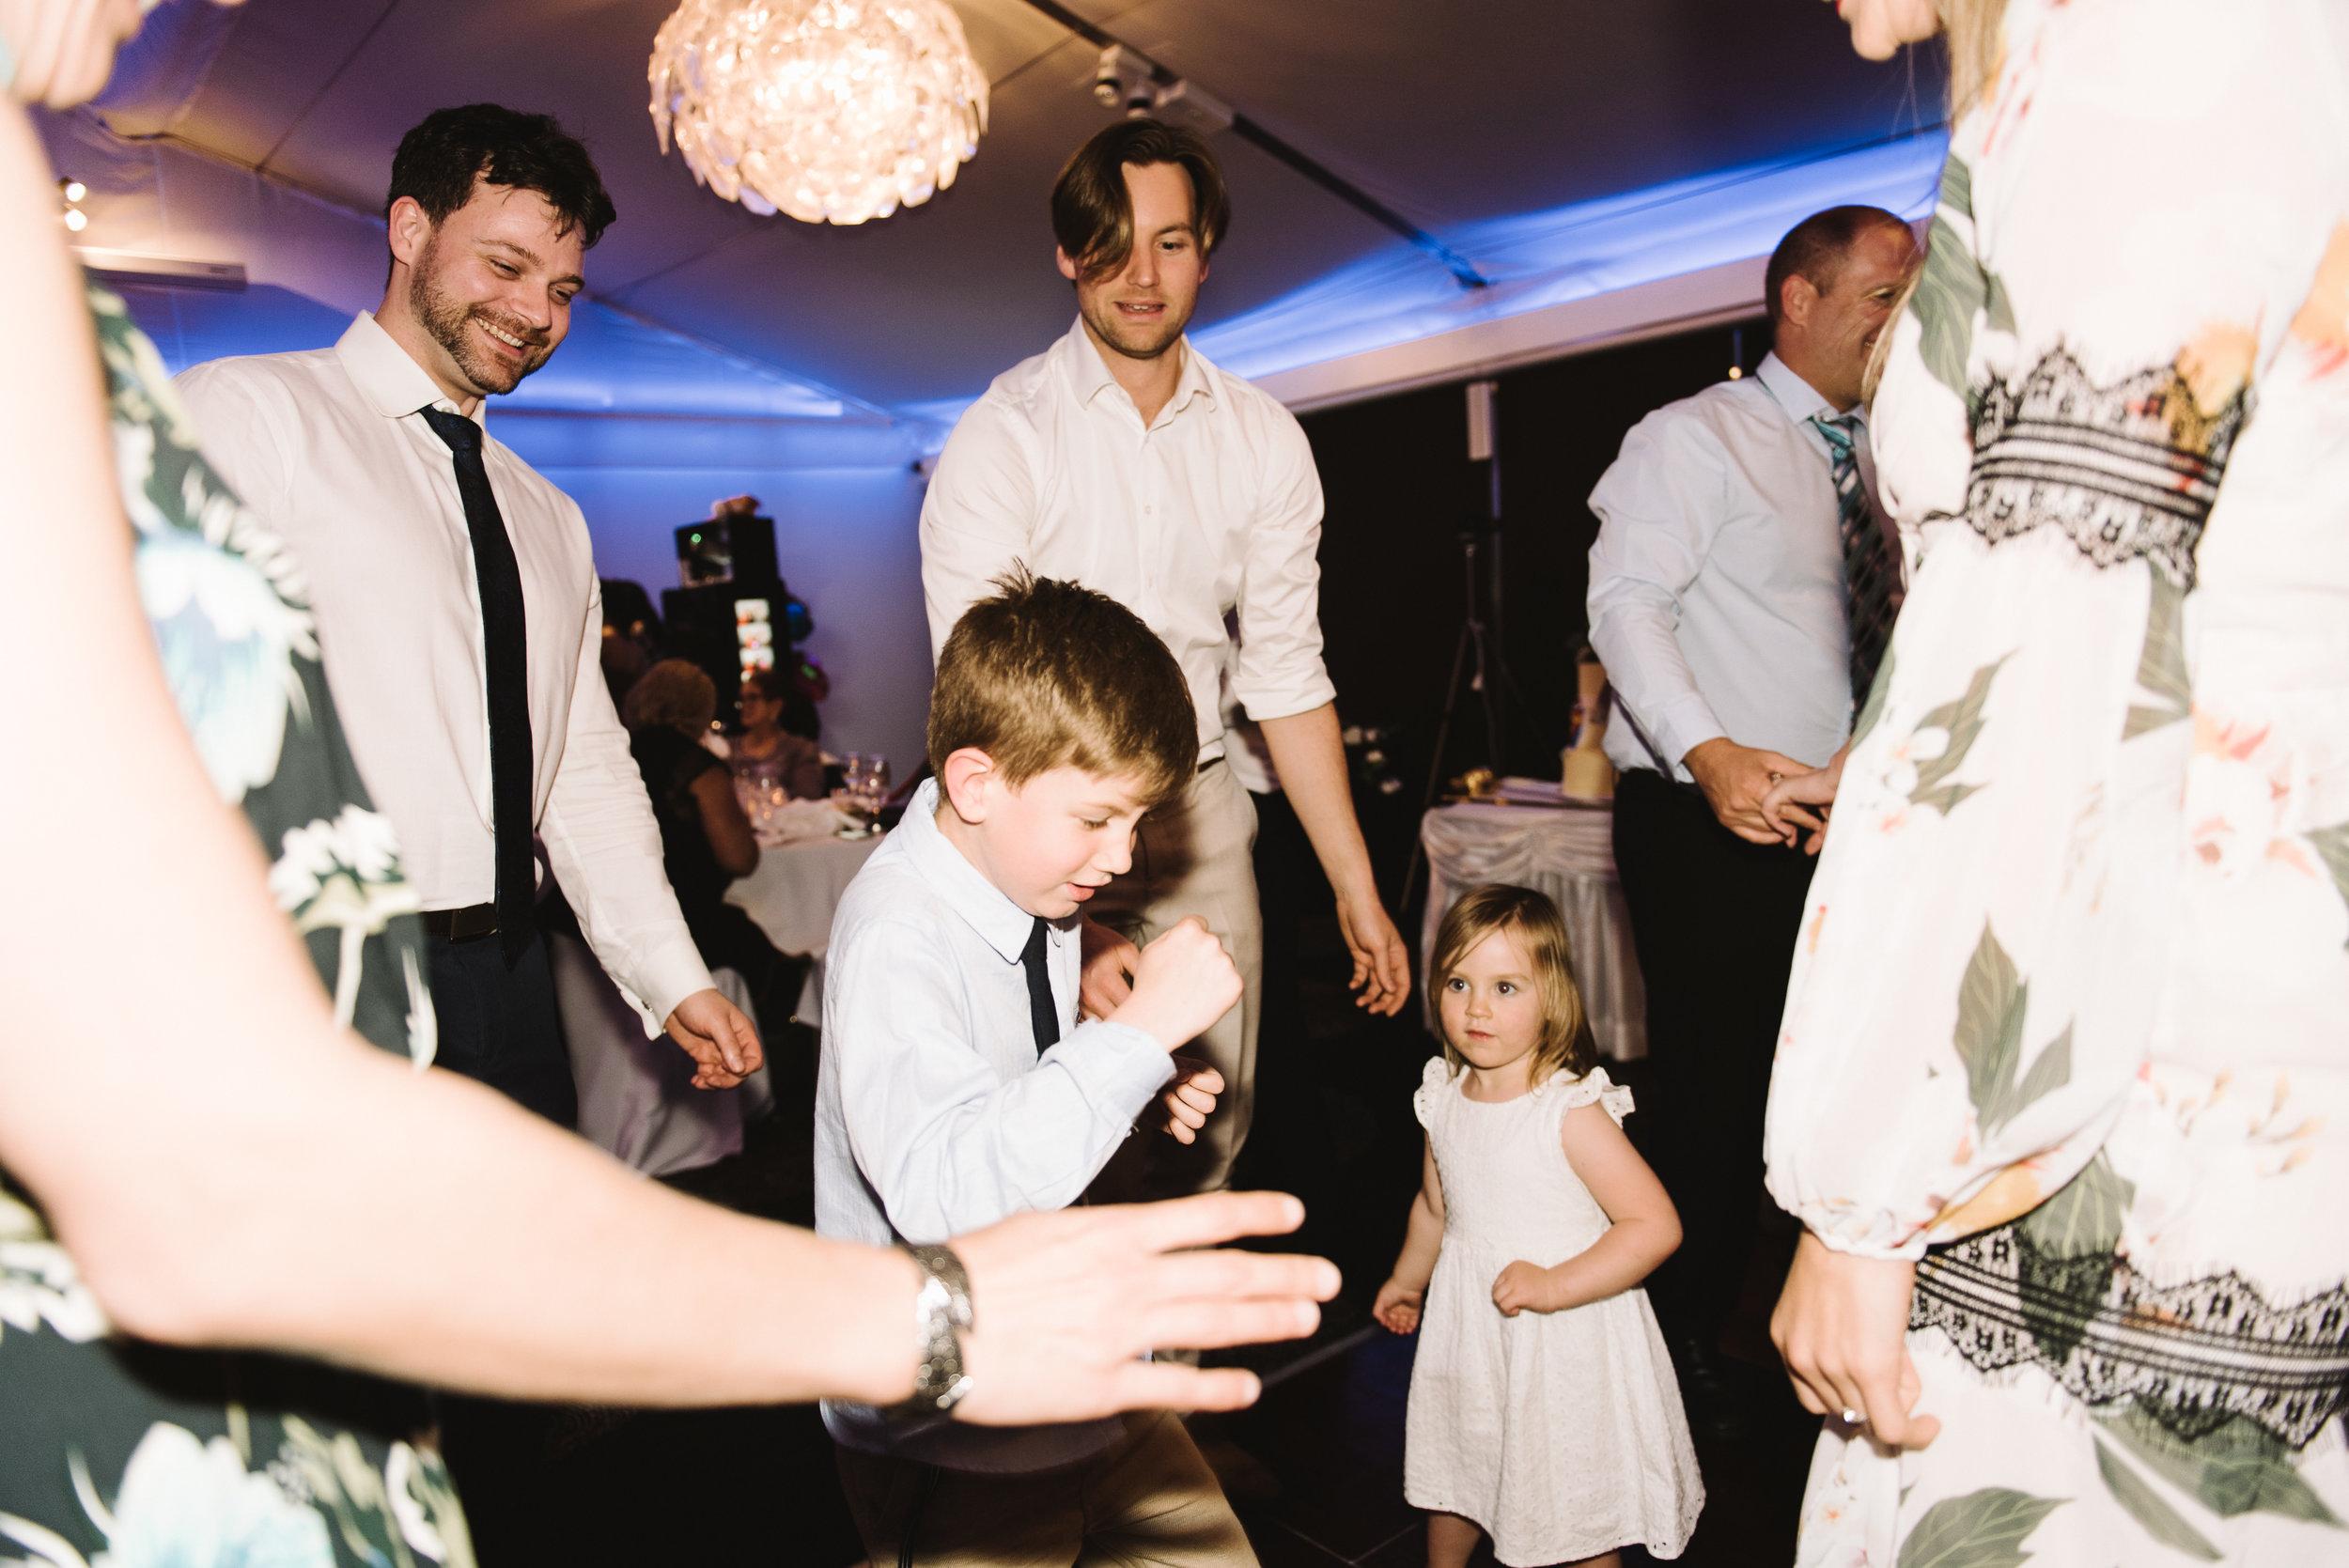 brisbane-wedding-photographer-130.jpg